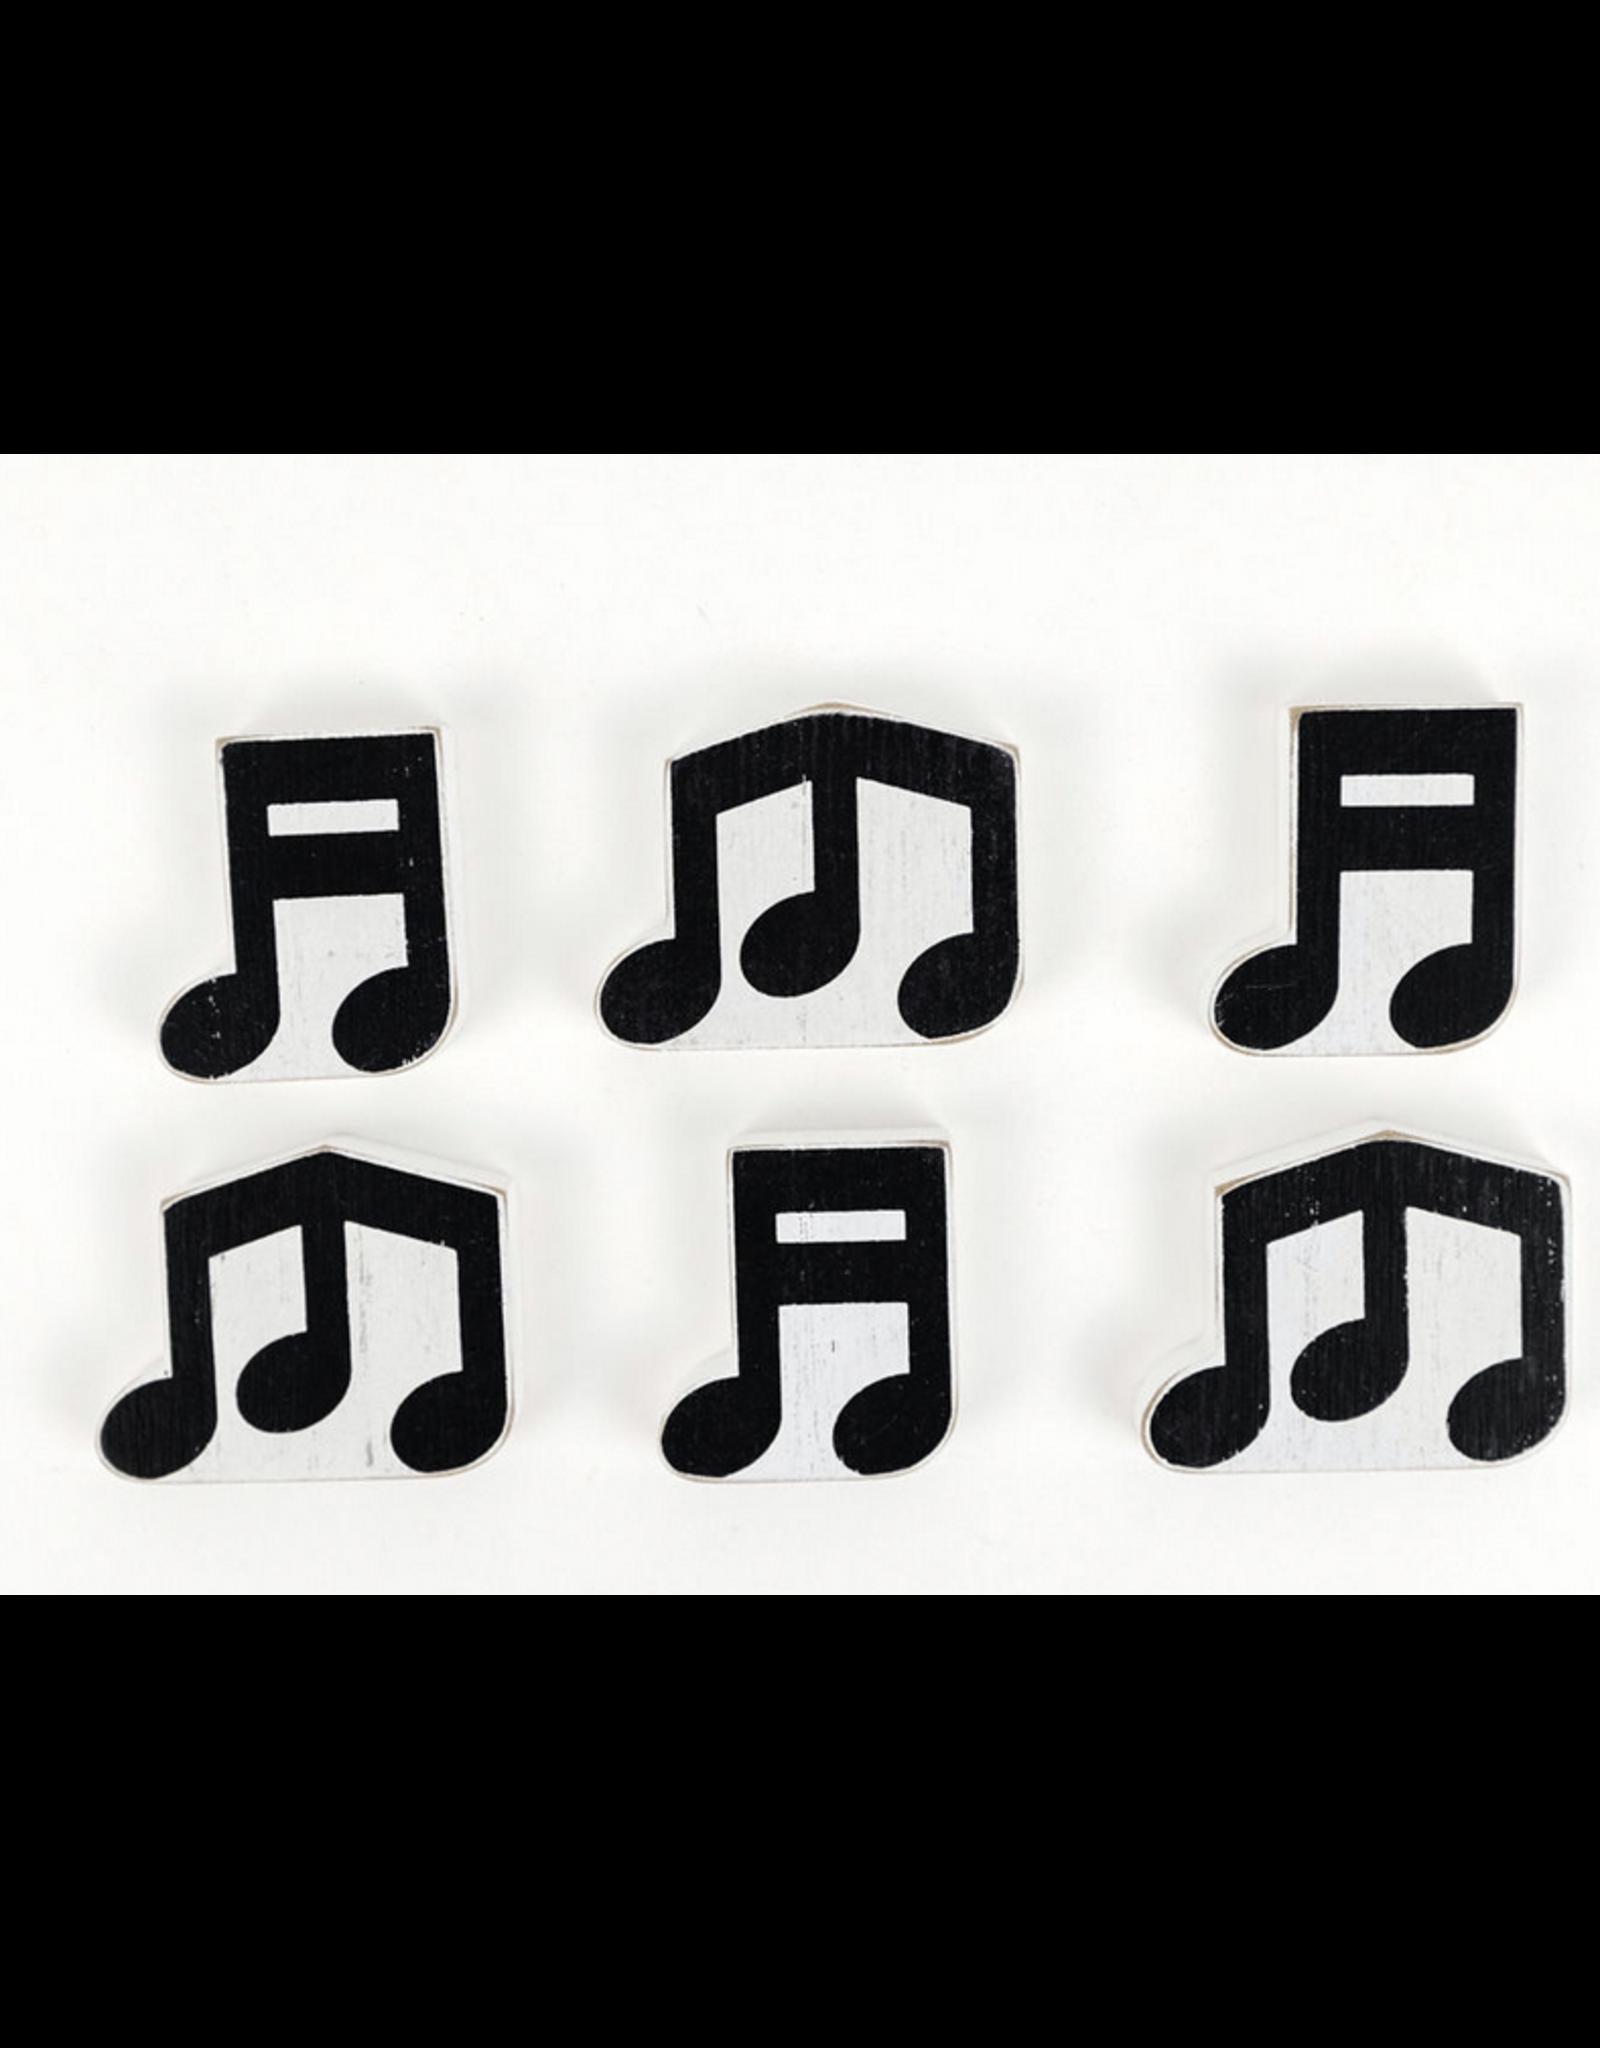 Adams & Co. Music Note Tiles